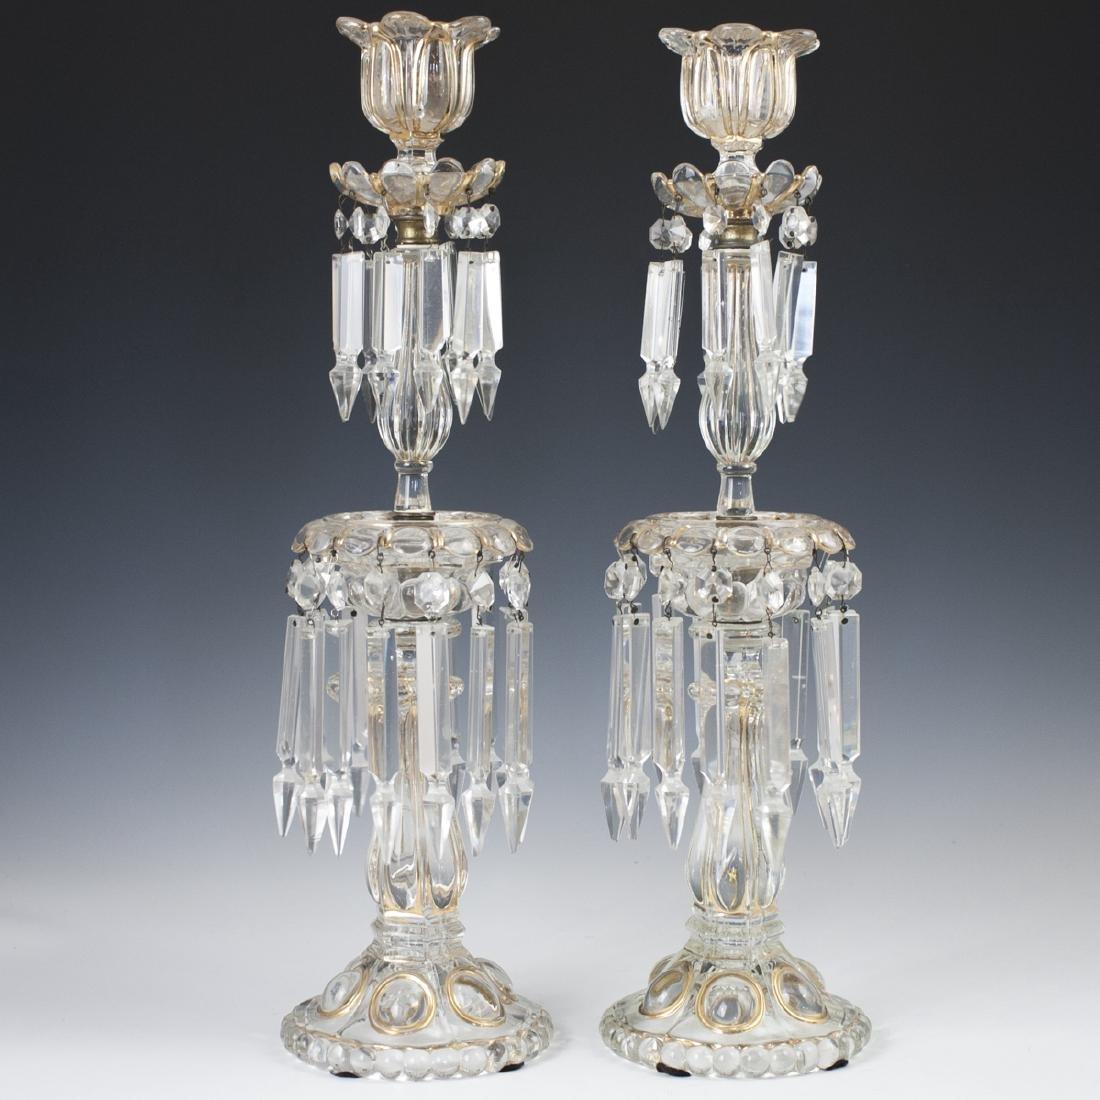 Antique Crystal Candlesticks